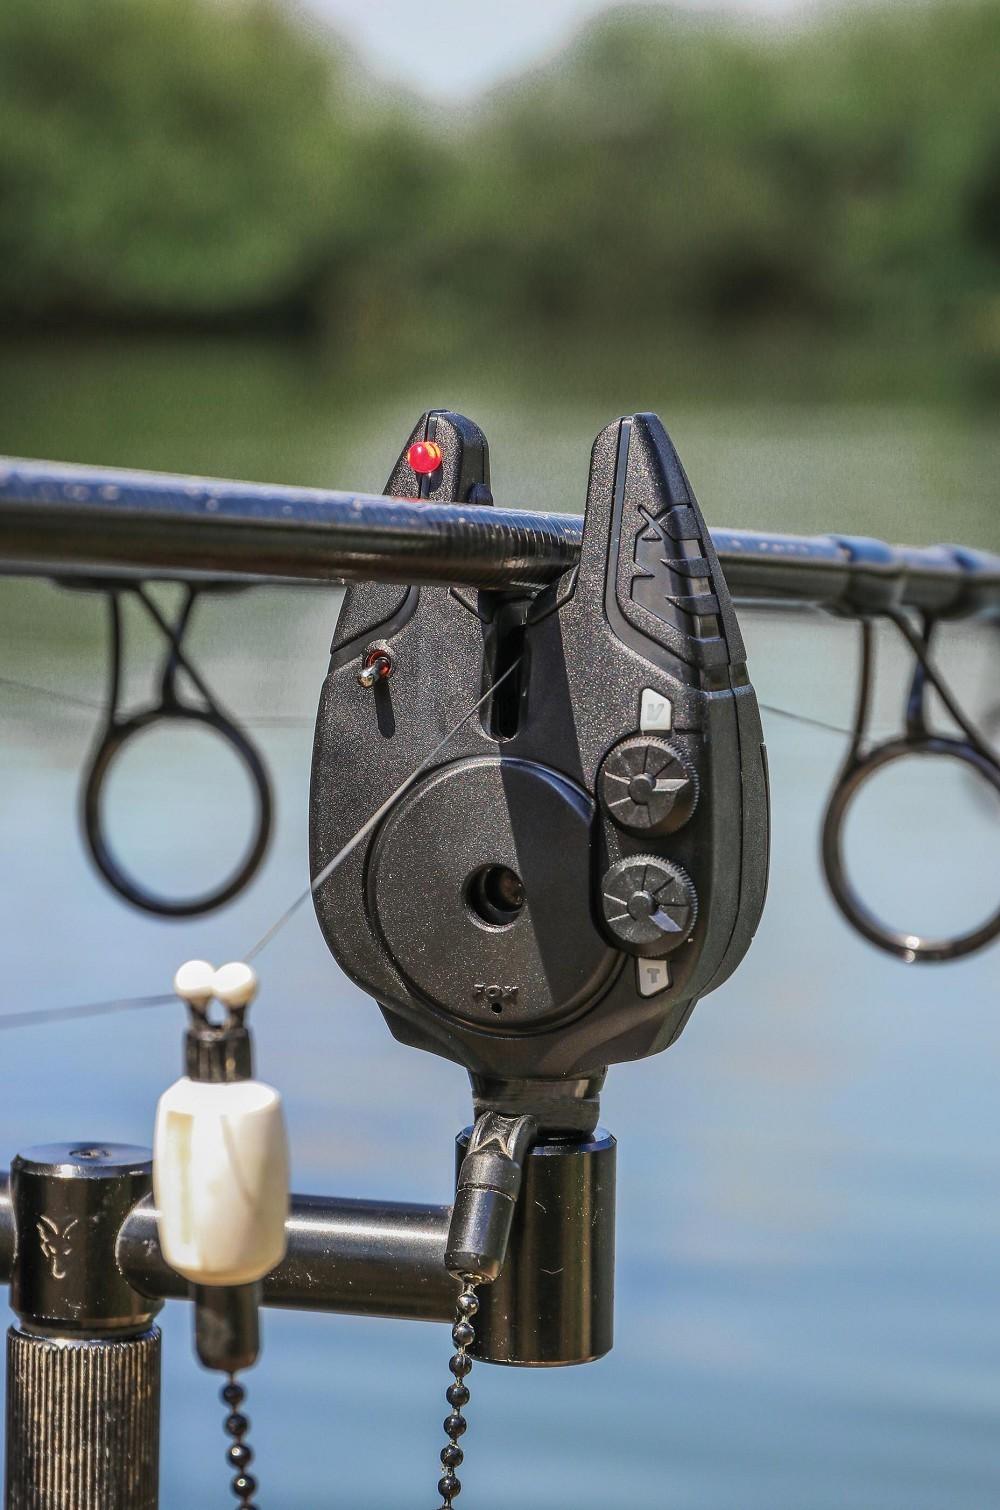 Fox Micron MX reciever work with Micron MX alarms Carp Fishing *New* CEI190